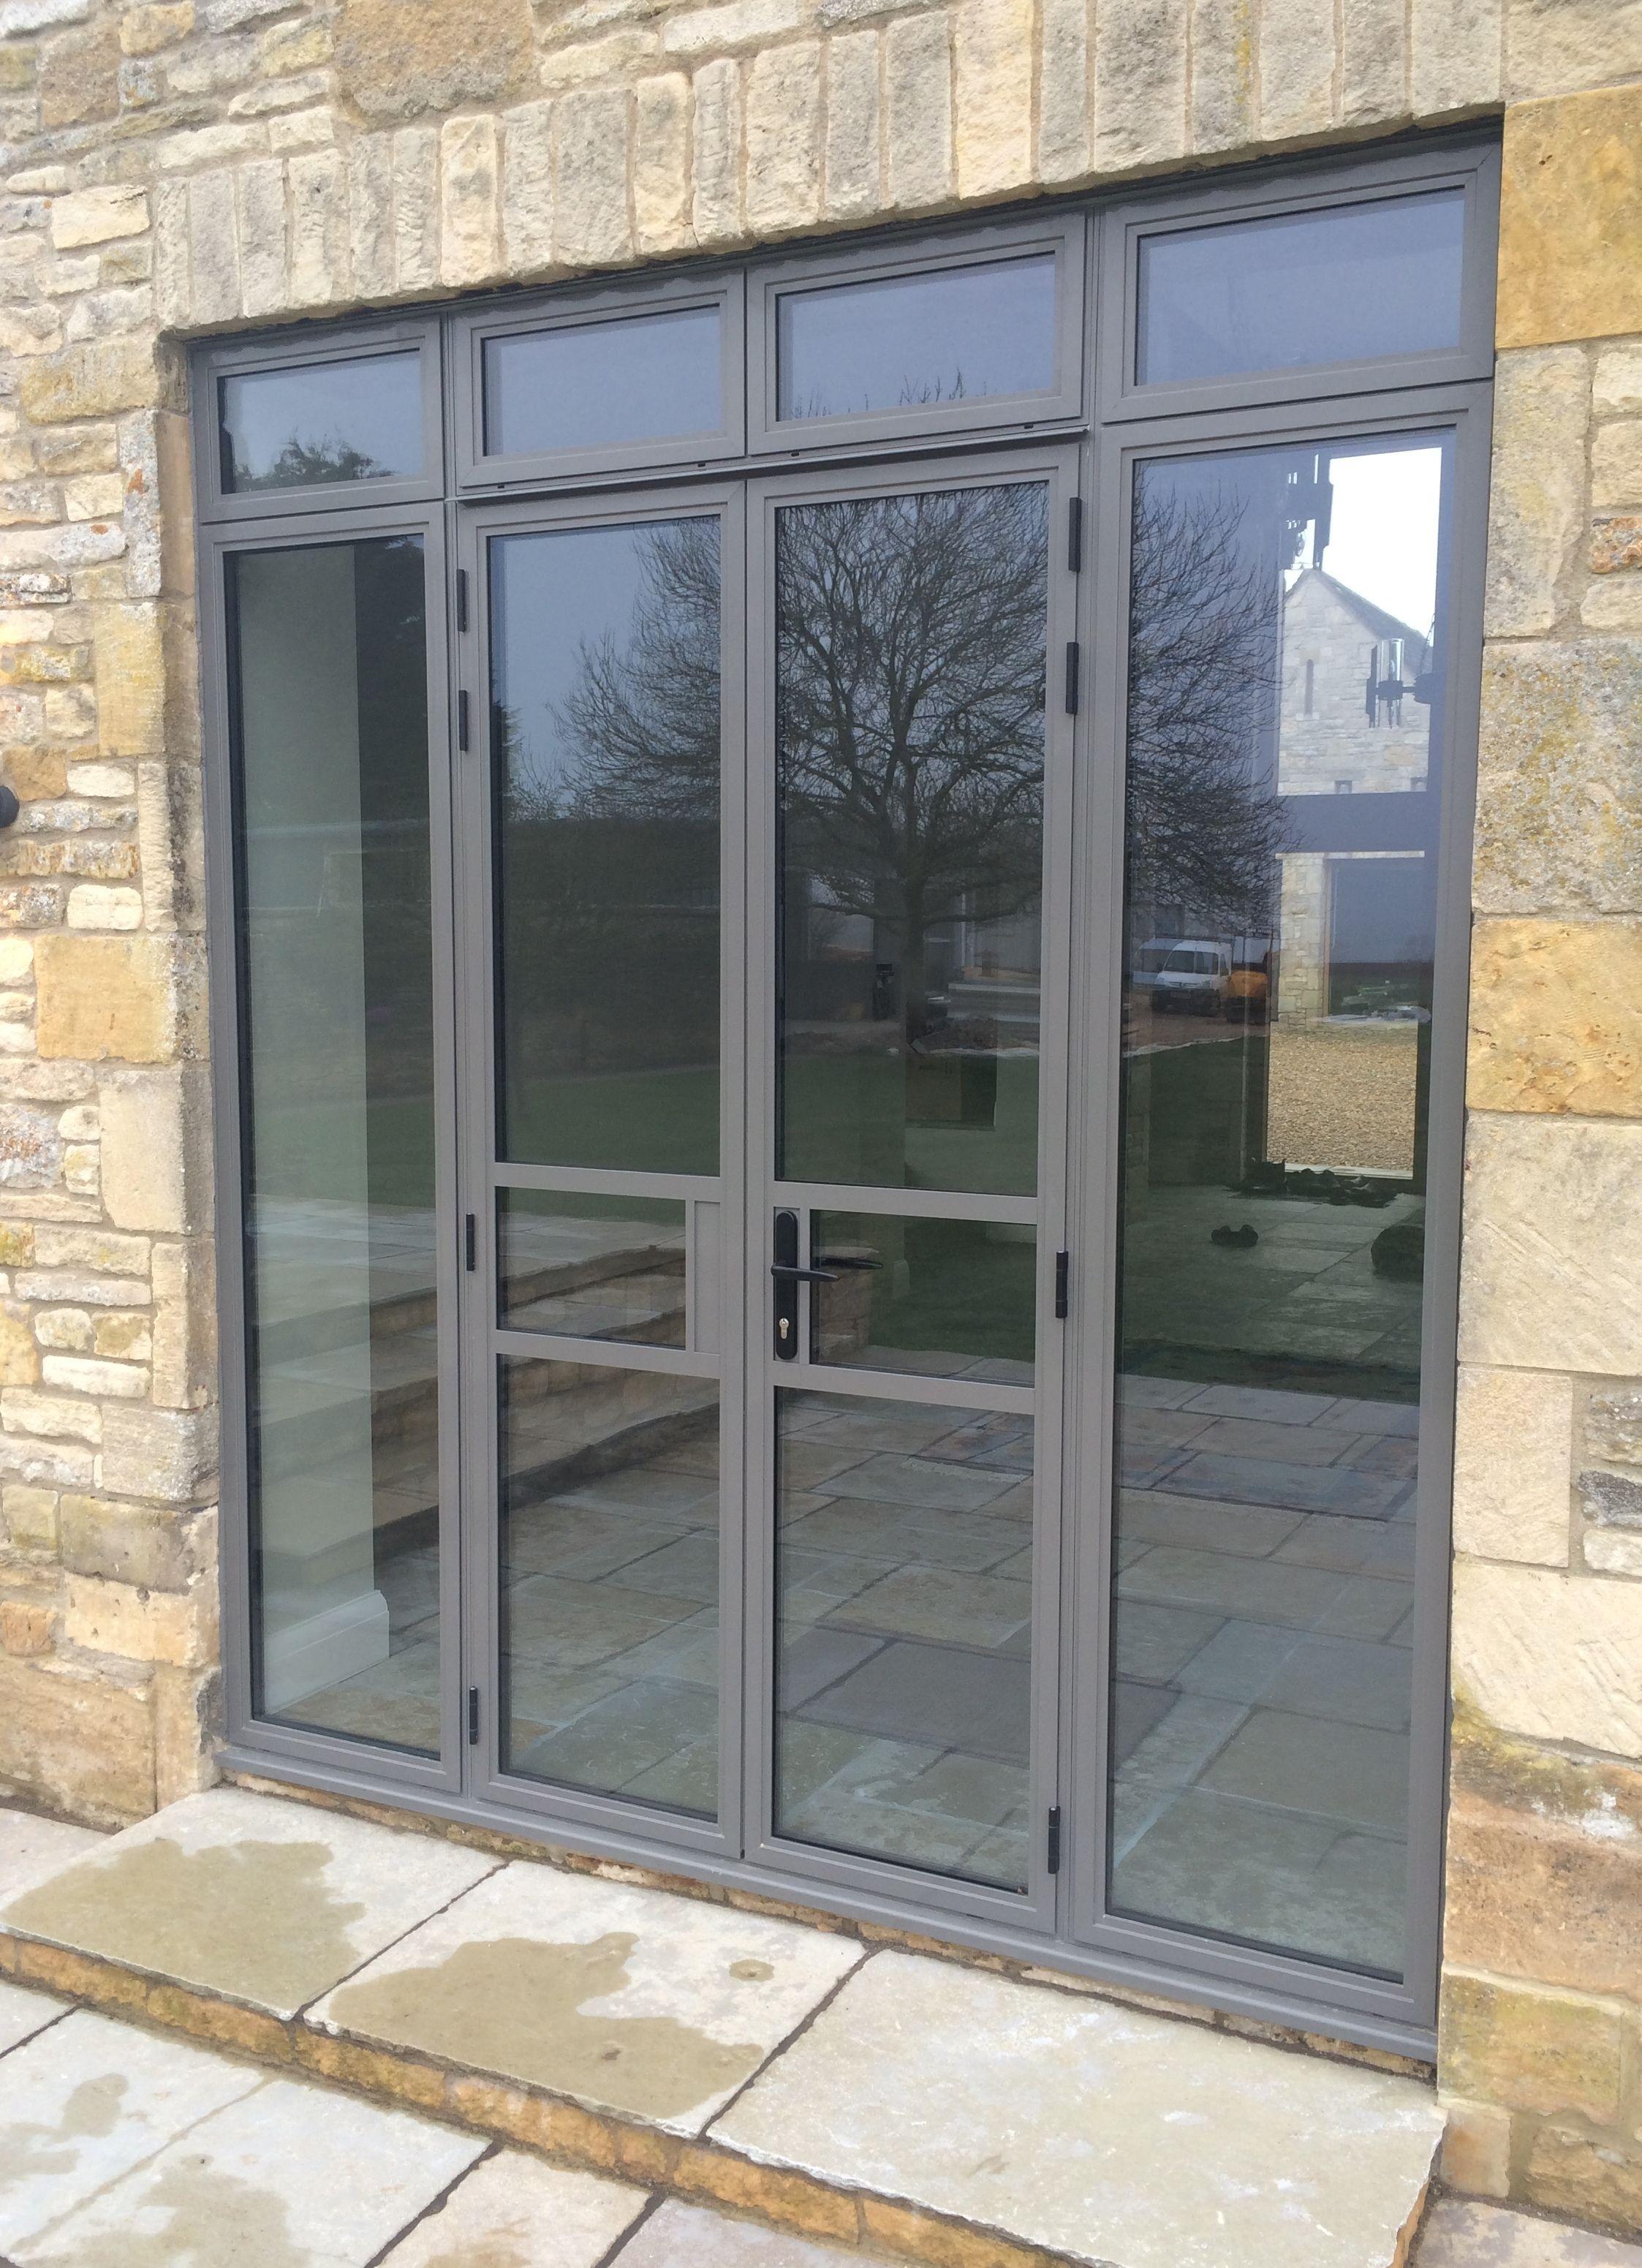 Bifold French Doors Home Design Ideas Pictures Remodel: Aluminium Heritage French Door. Designed To Match Original